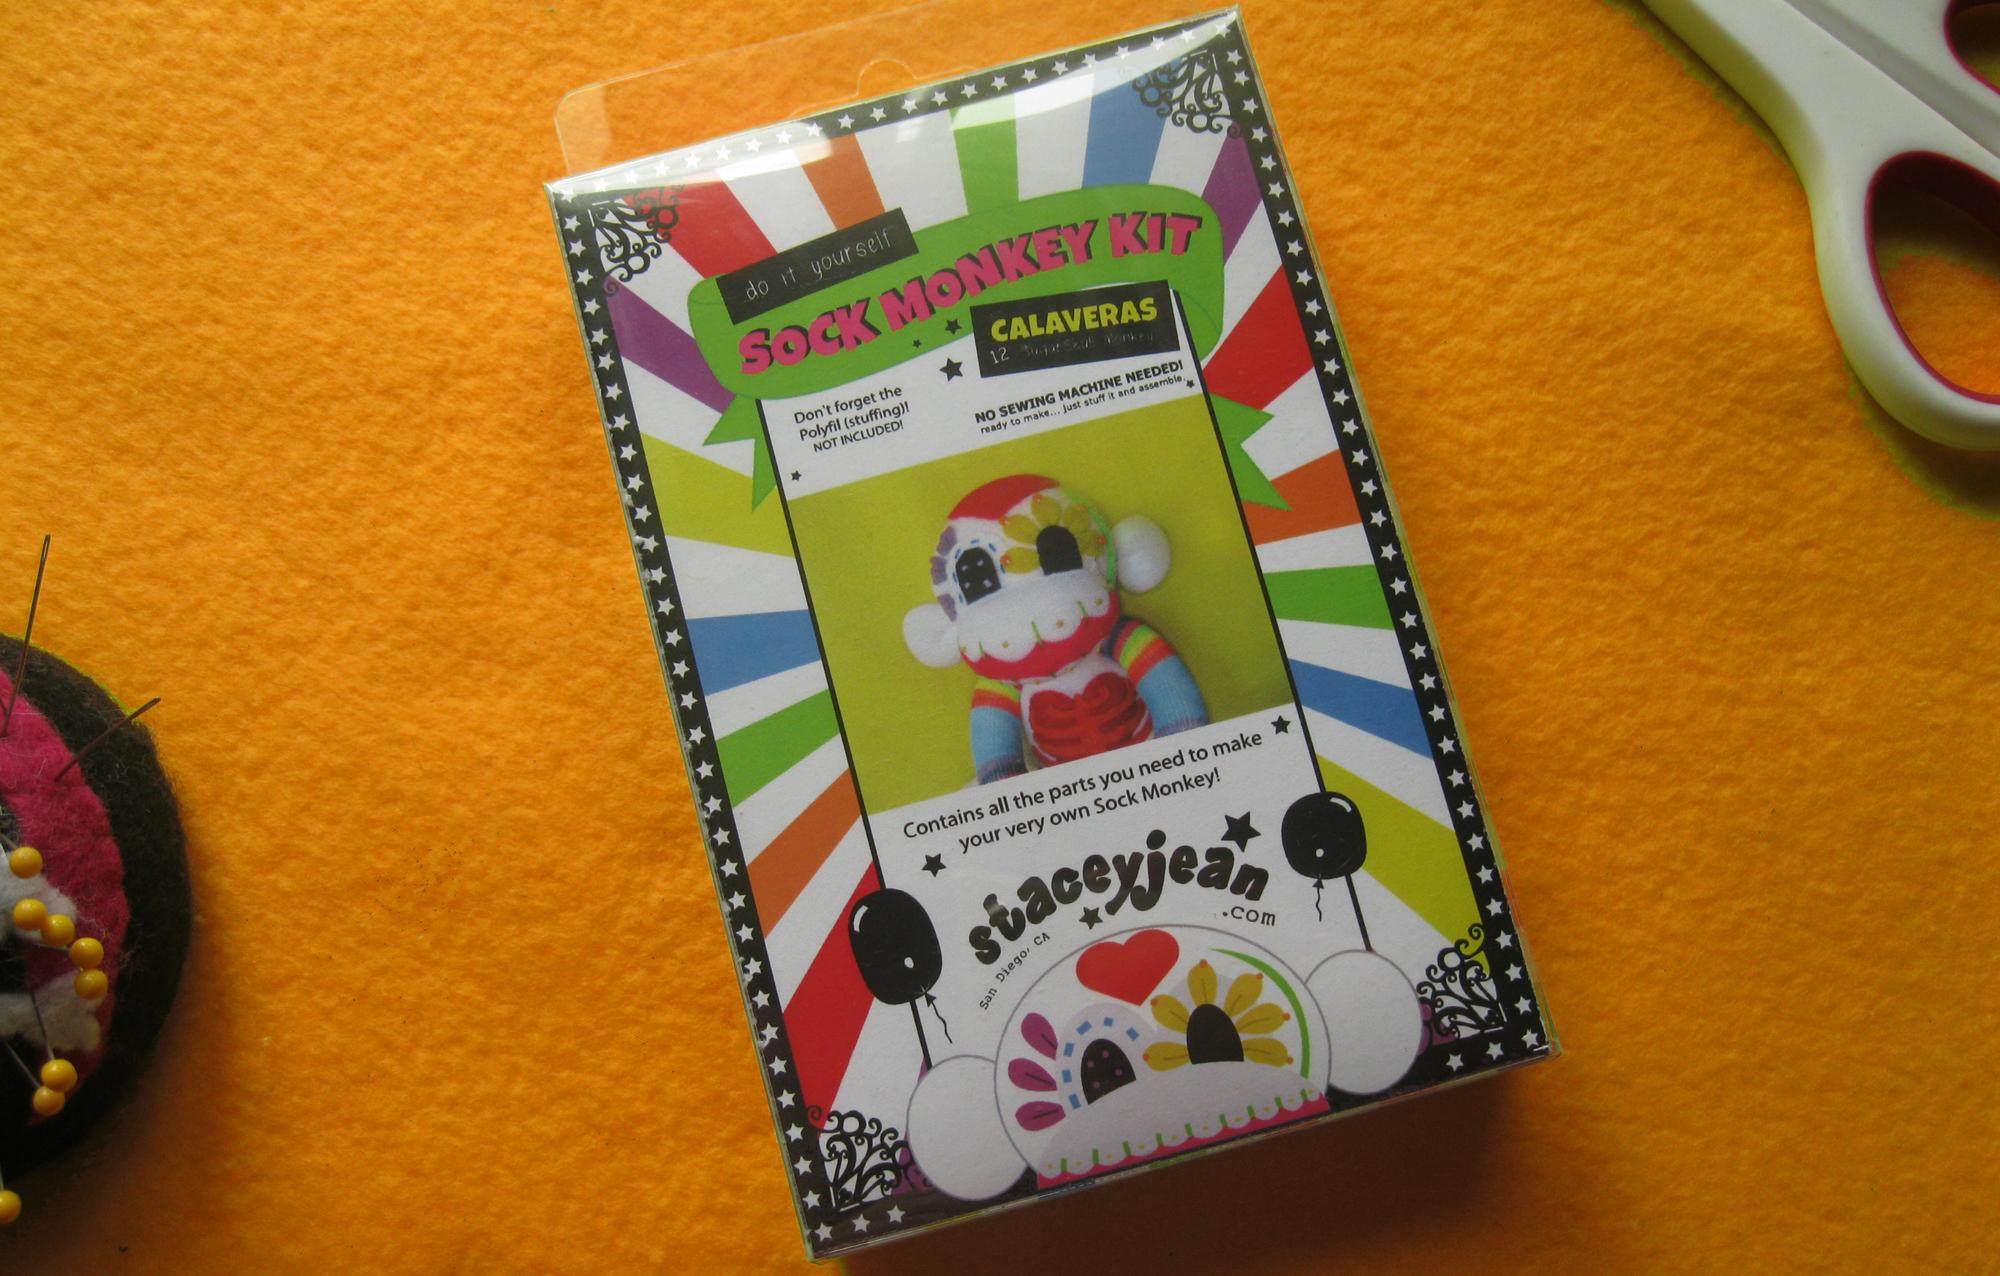 Rainbow Sugar Skull Sock Monkey Diy Kit White Body Plush Doll Make It Yourself No Sewing Machine Needed!